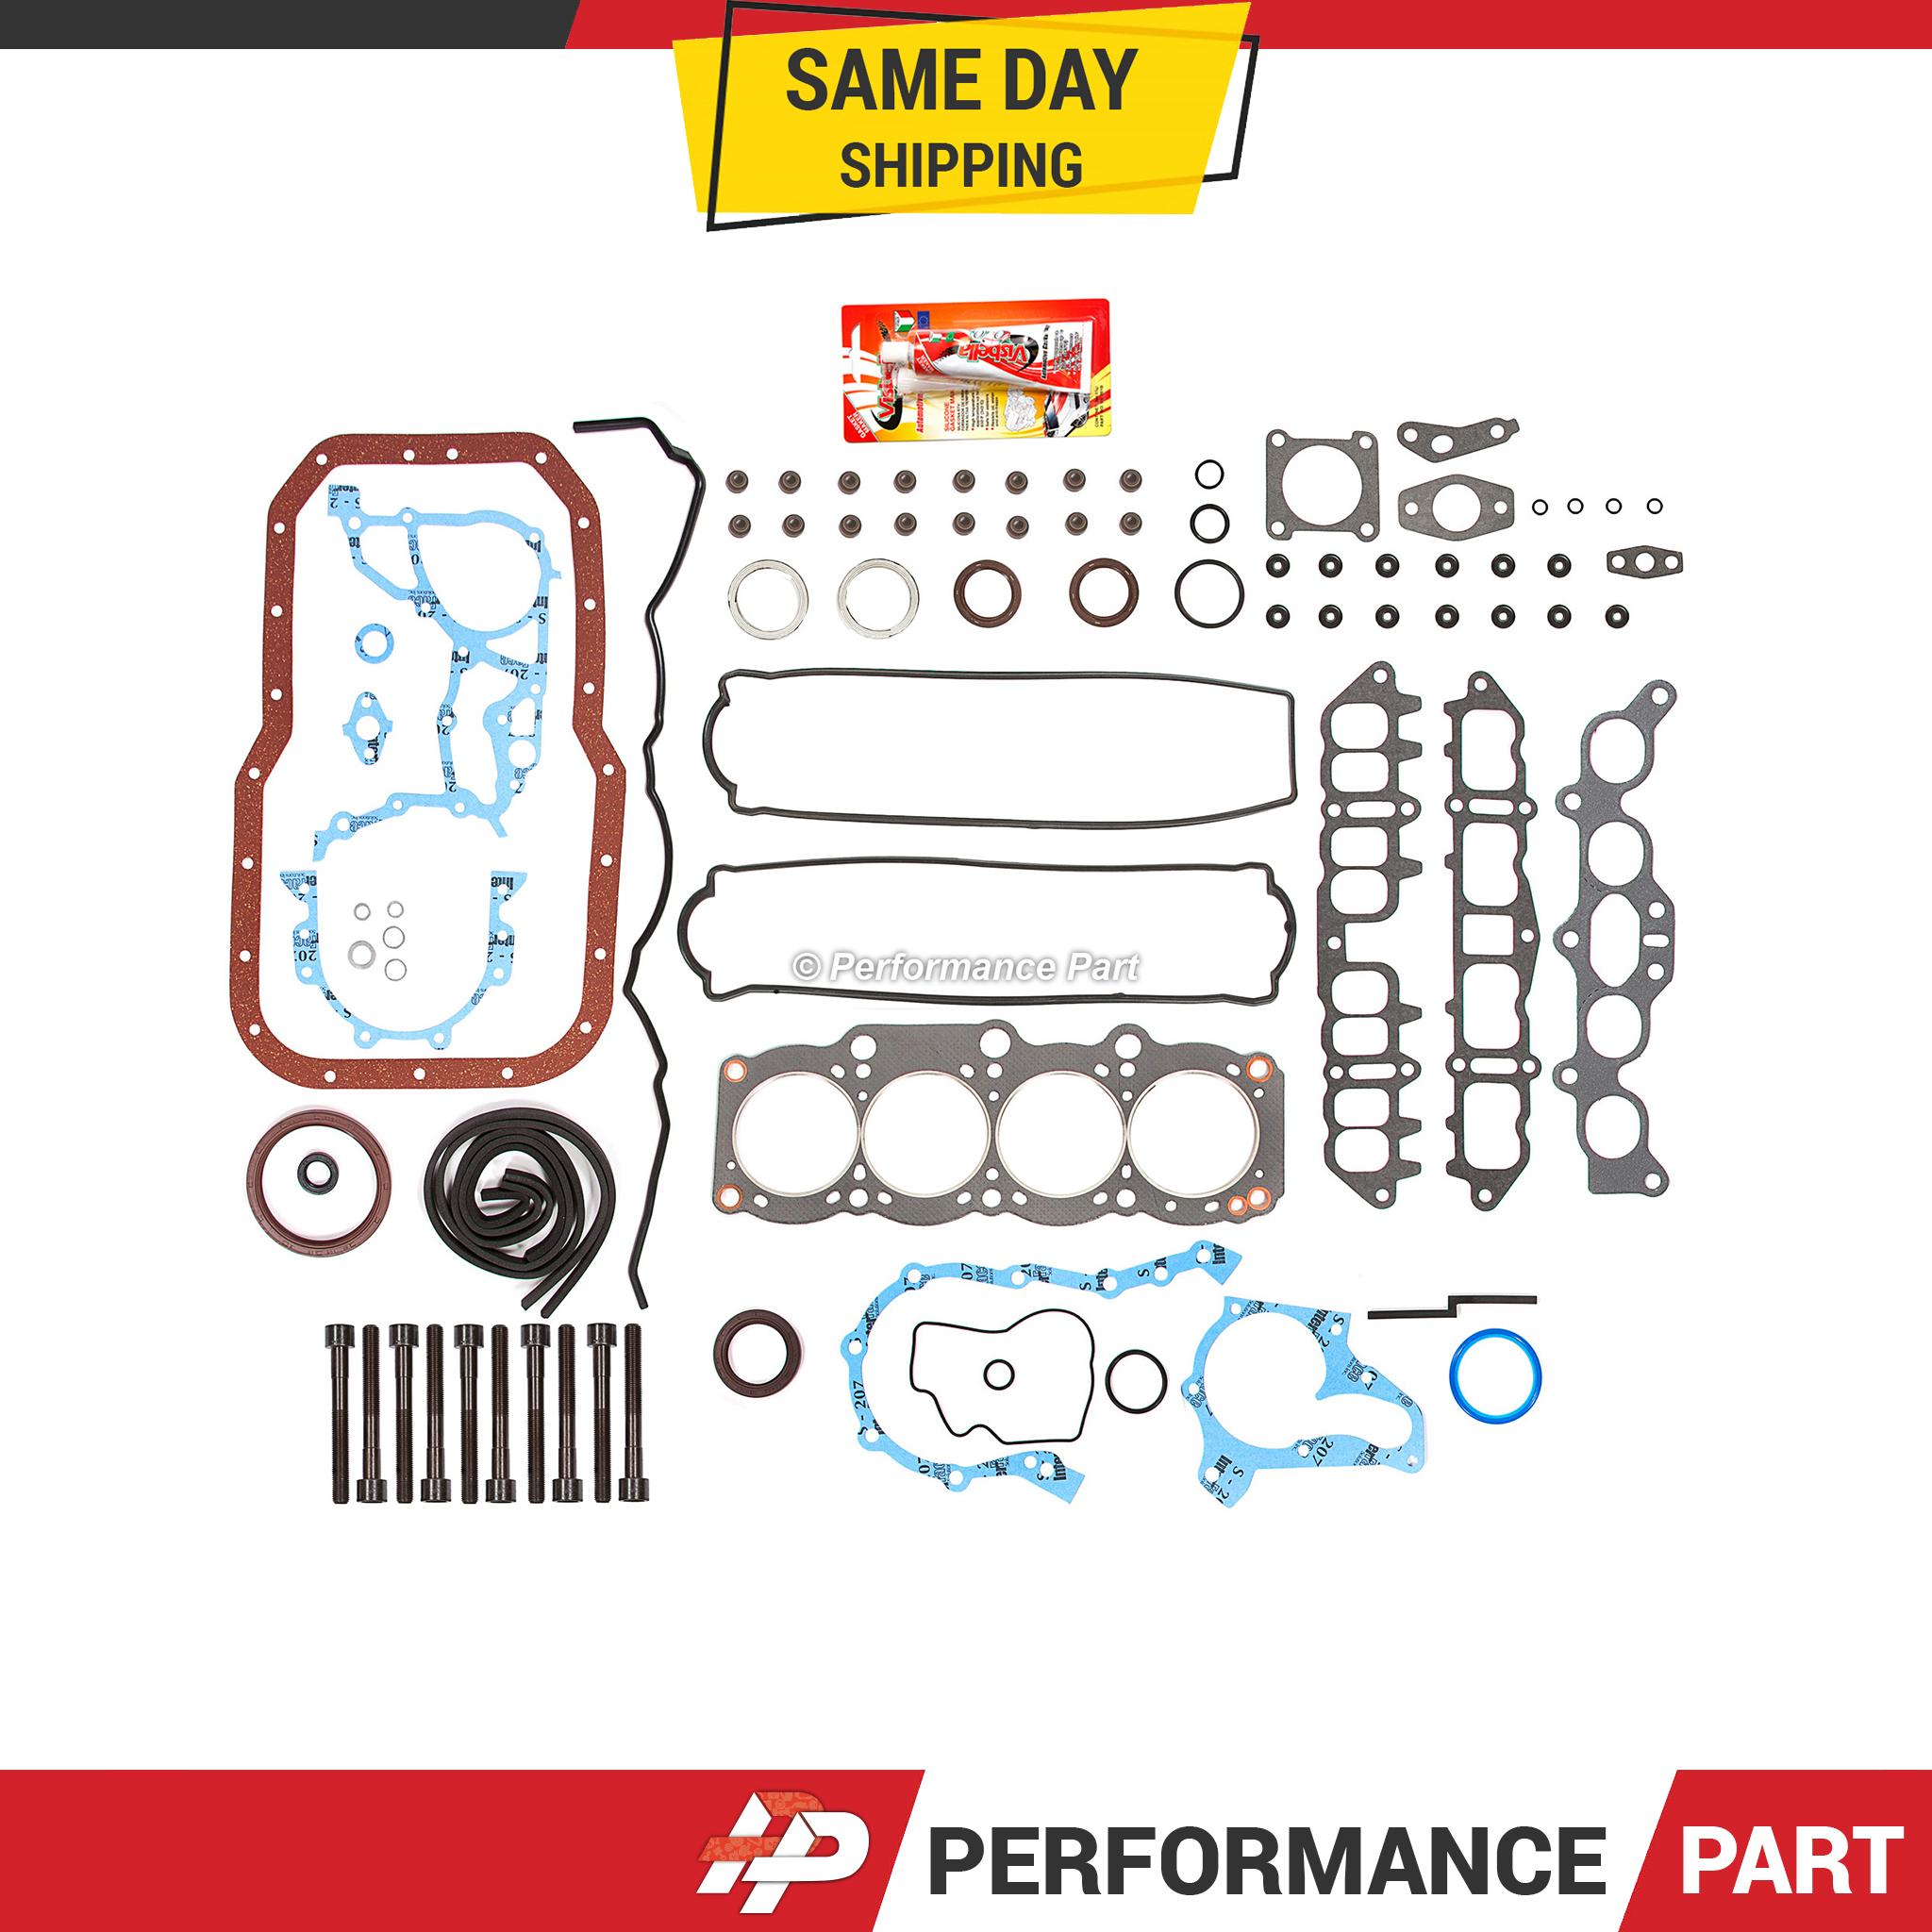 Head Gasket Bolts Set Fit 86-89 Toyota Celica GTS 2.0 DOHC 16V 3SGELC